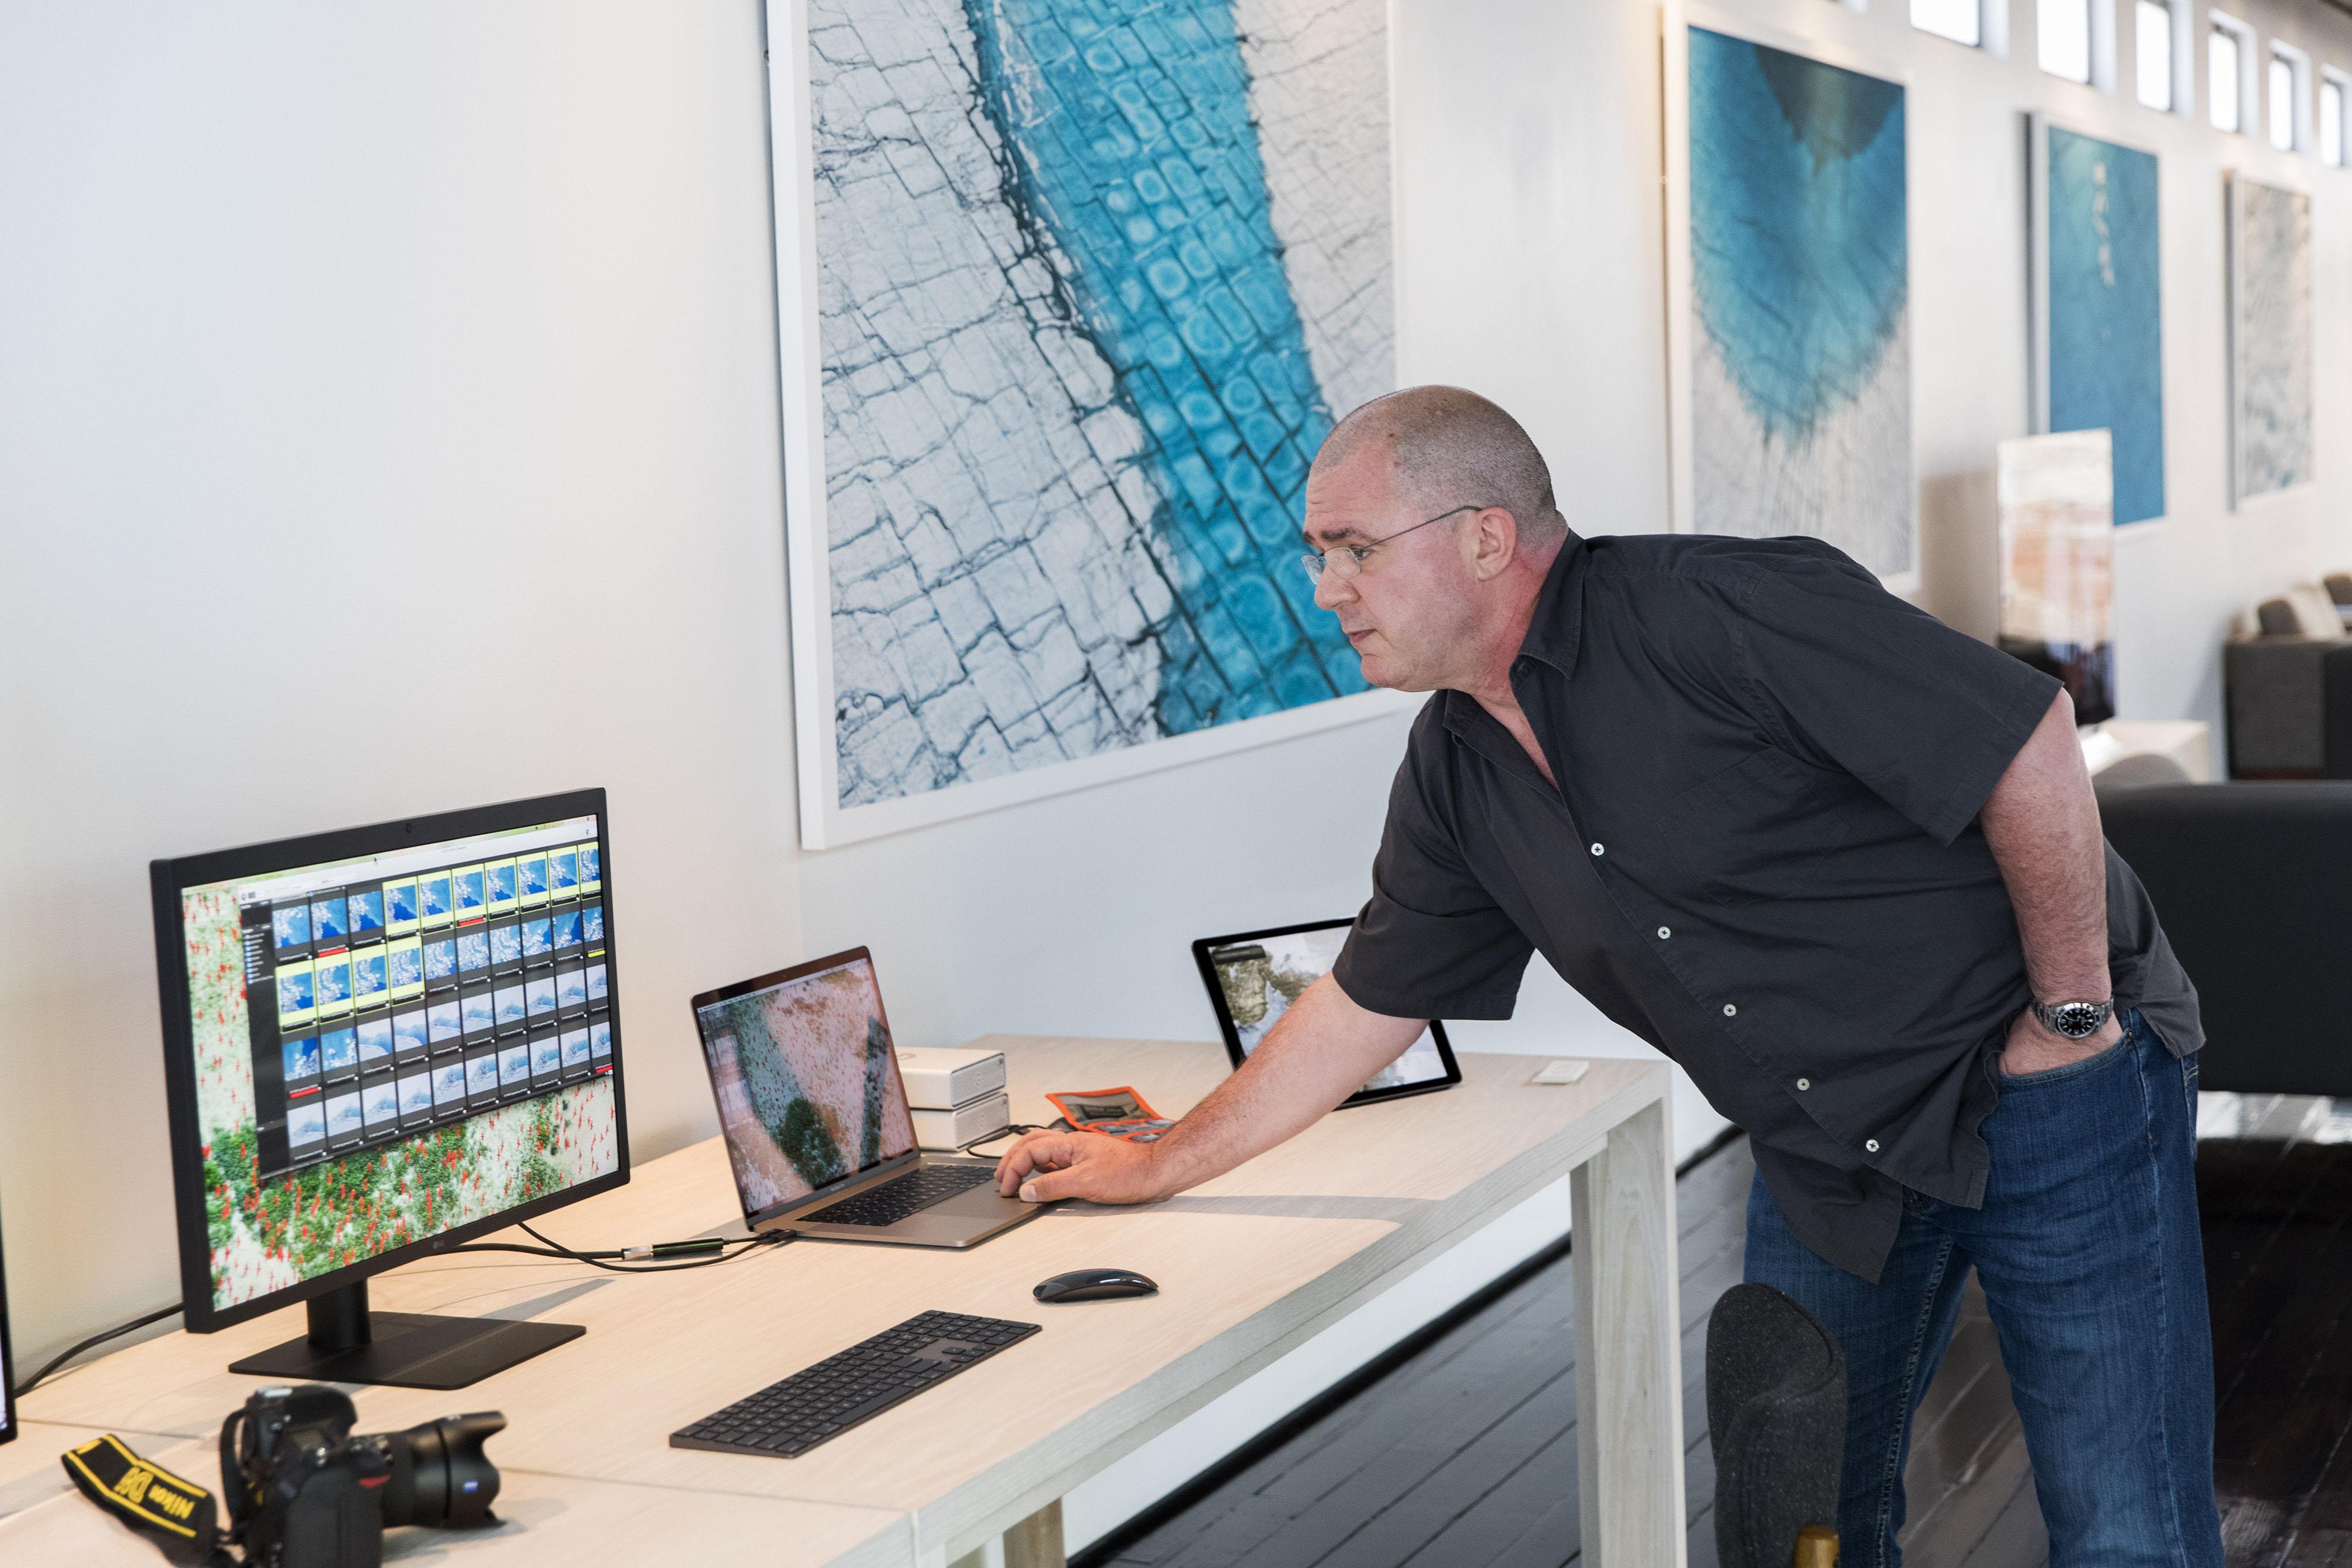 180711 MacBookPro NewYorkCity BK 41042